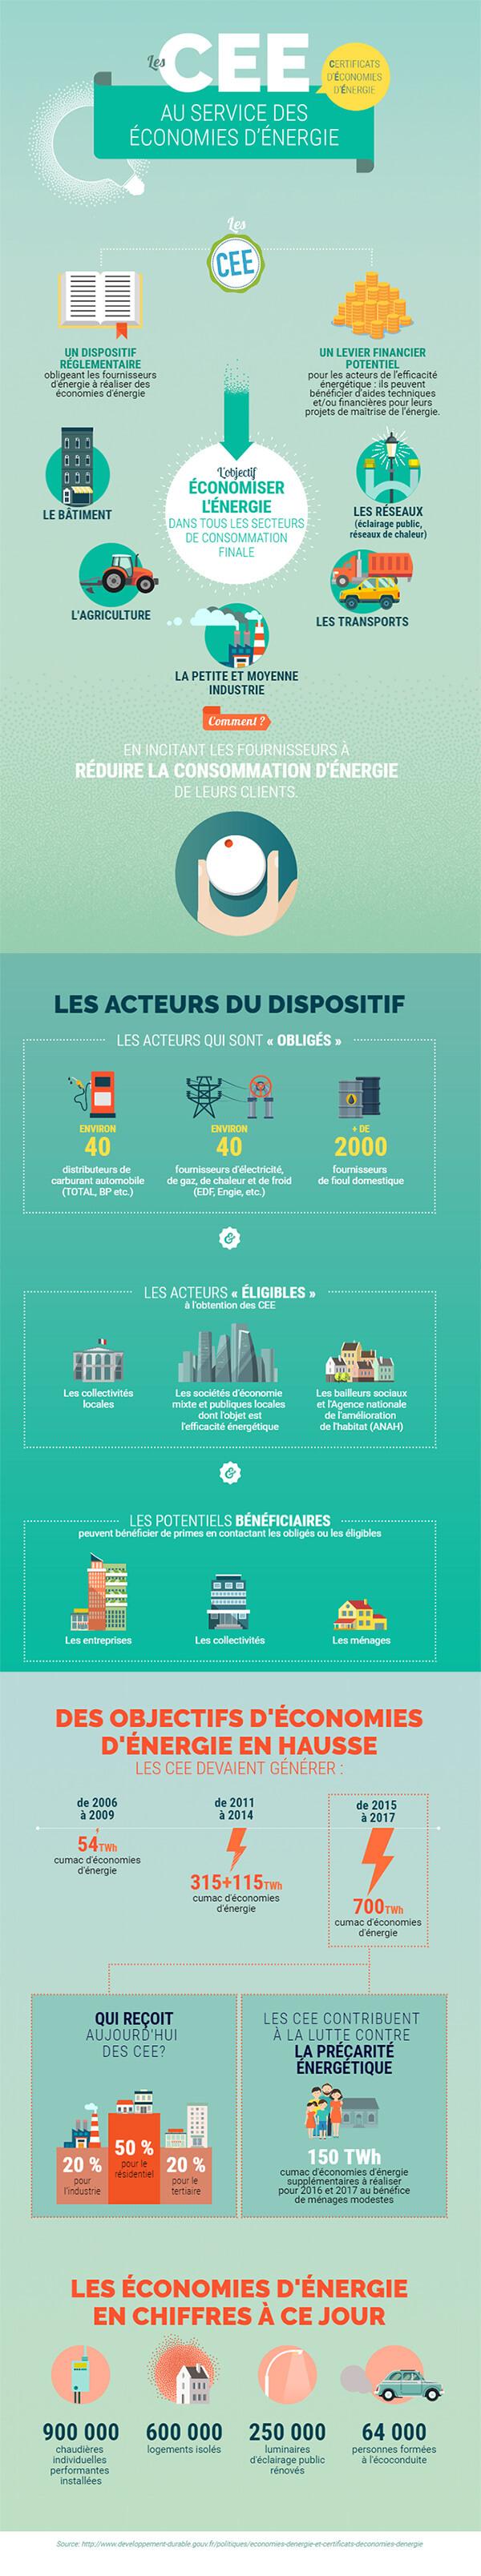 Infographie CEE Ademe